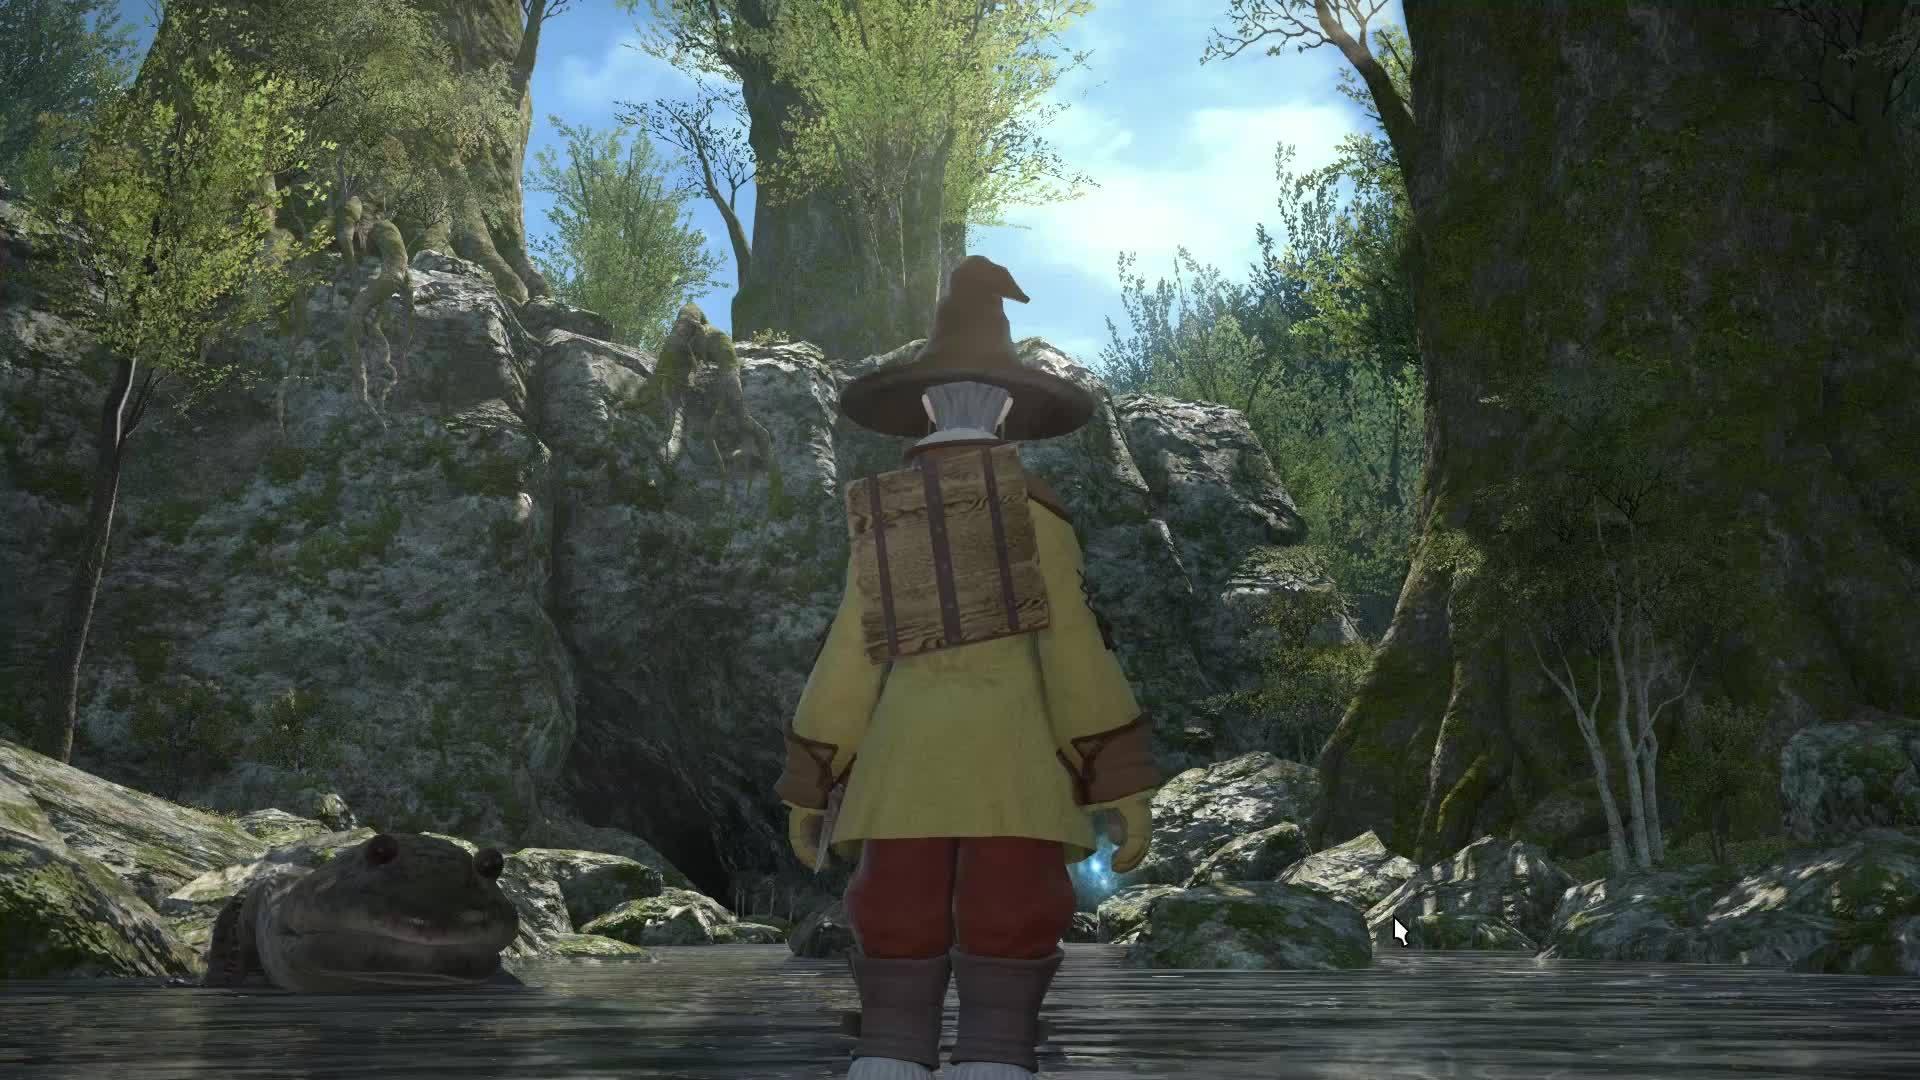 60fpsgaminggifs, [Final Fantasy XIV] The lighting, the environments, the character design... (reddit) GIFs